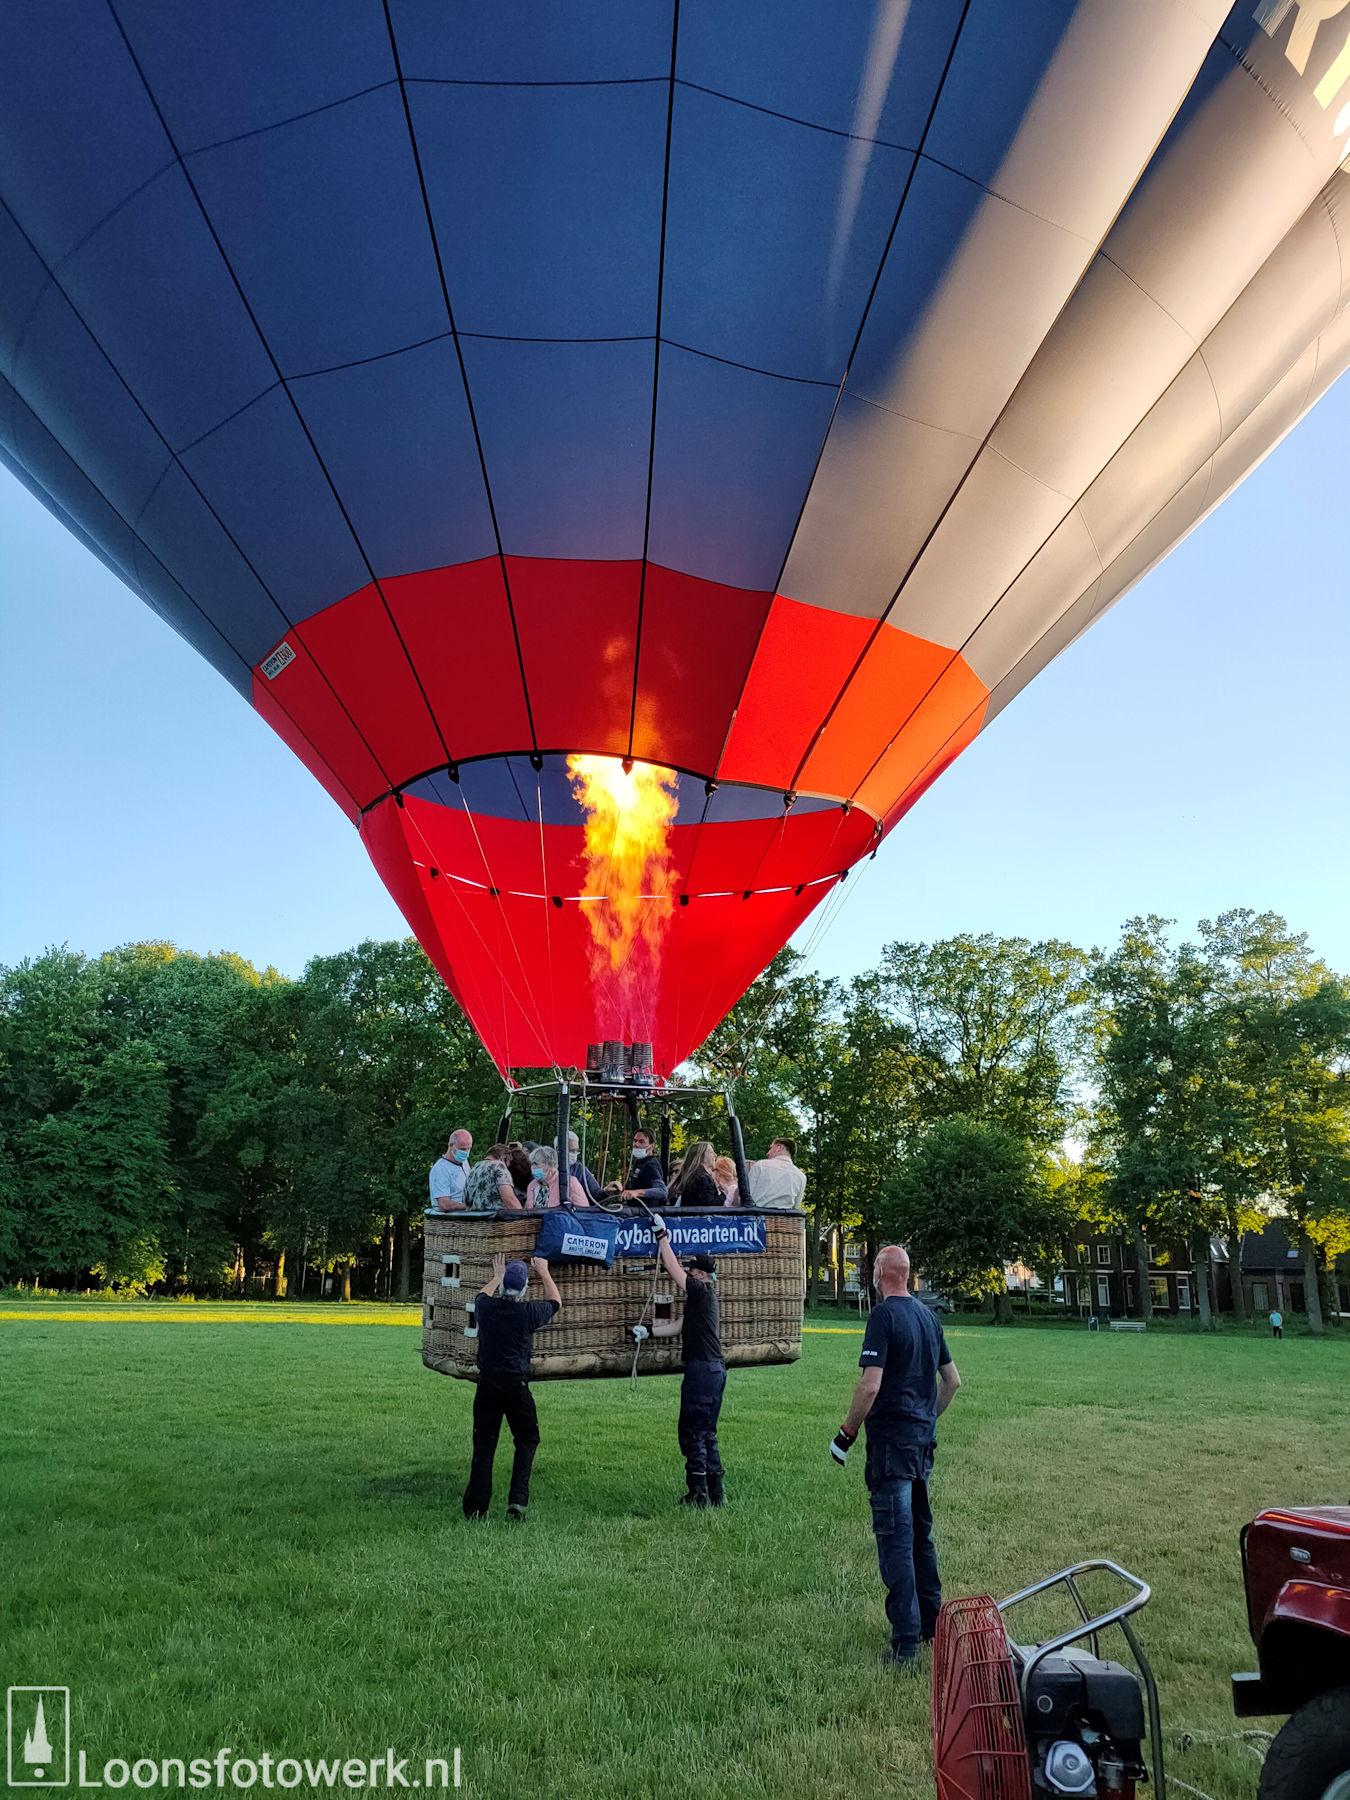 Ballonvaart vanaf de Kasteelweide 27